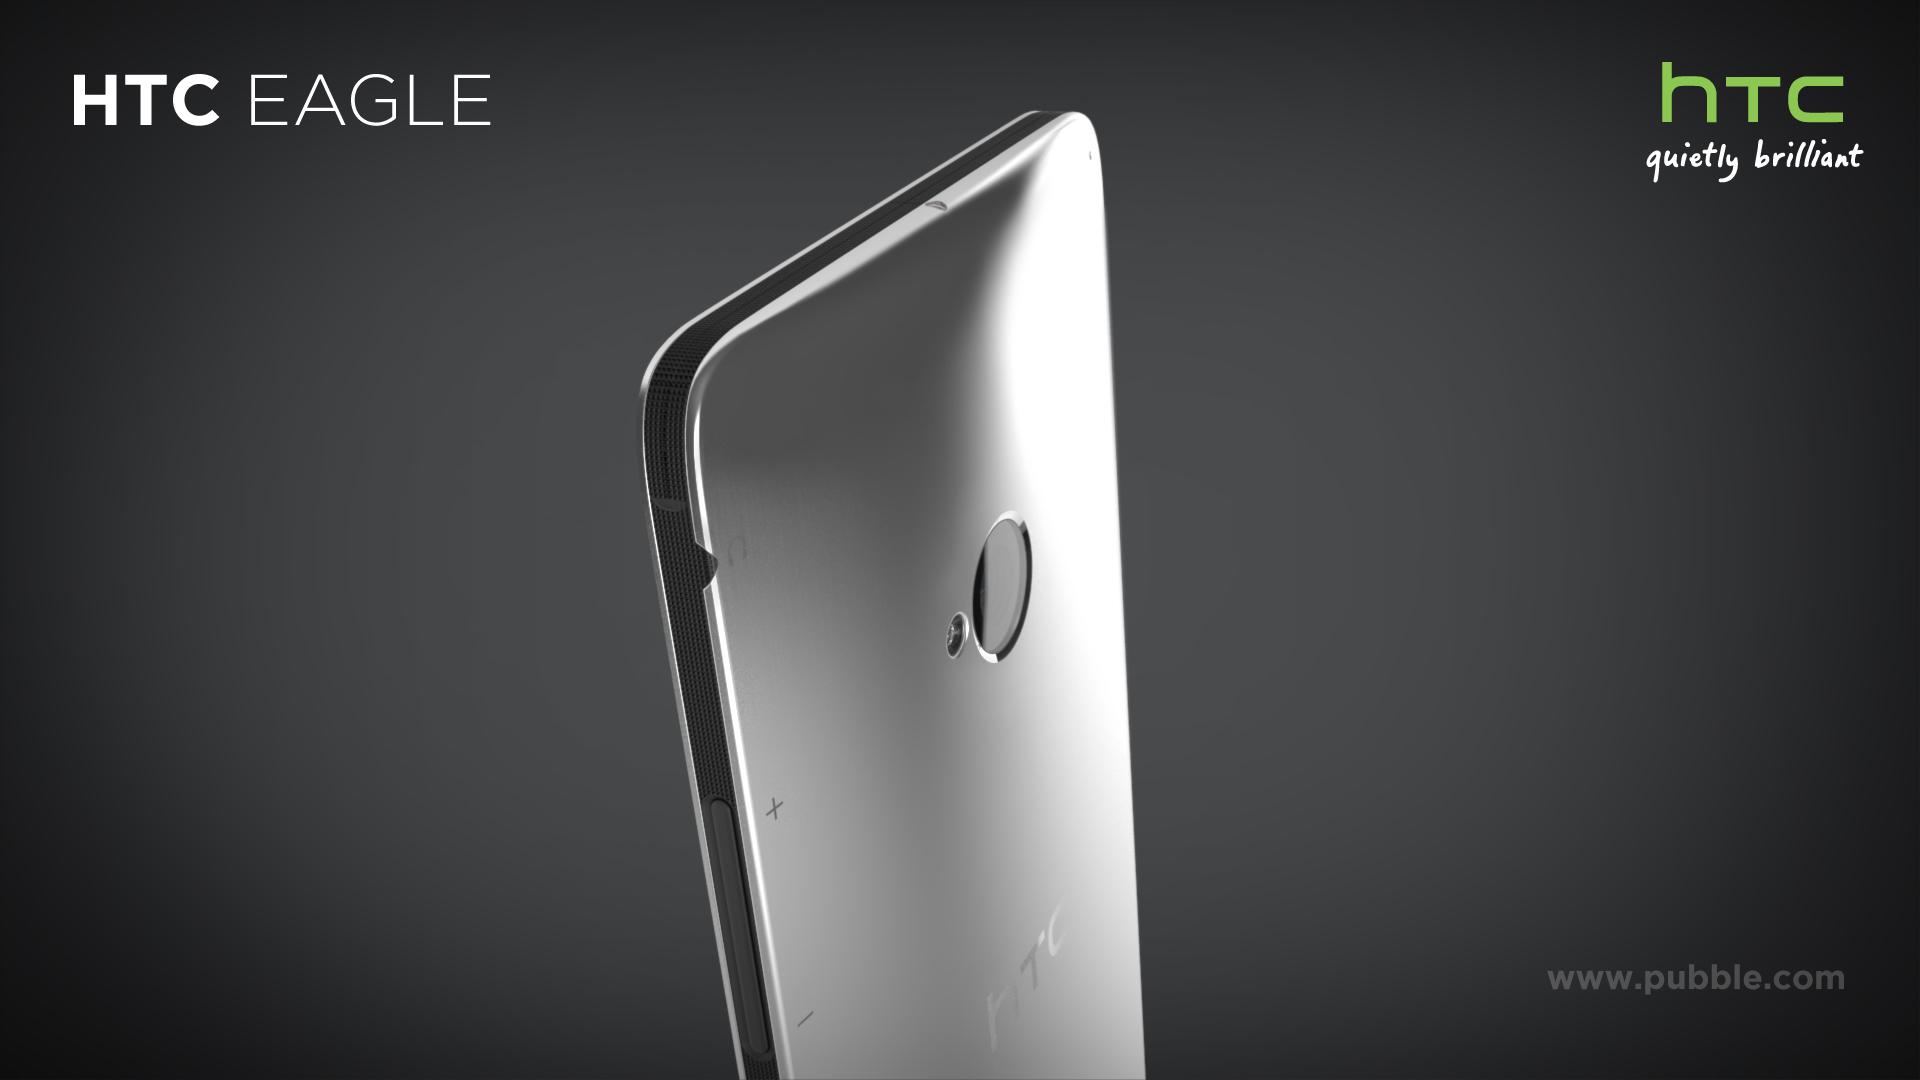 HTC Eagle - APN 3